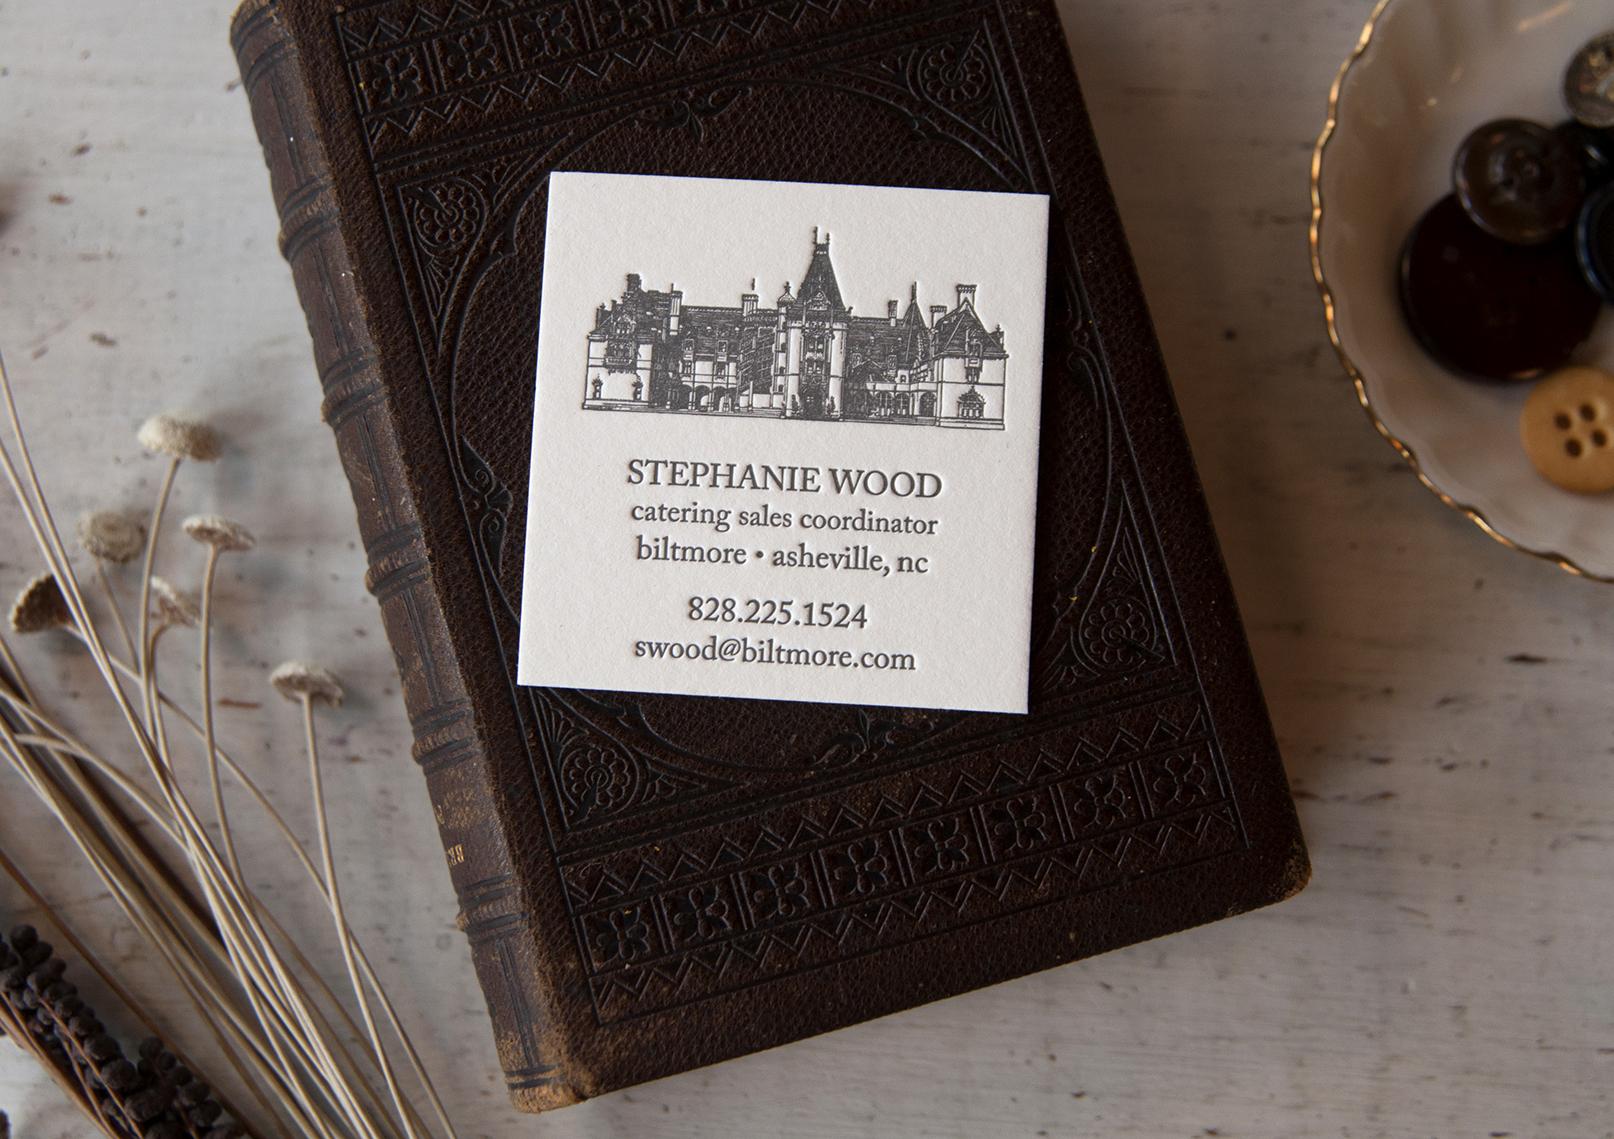 Biltmore Catering Business Cards : Letterpress Printed